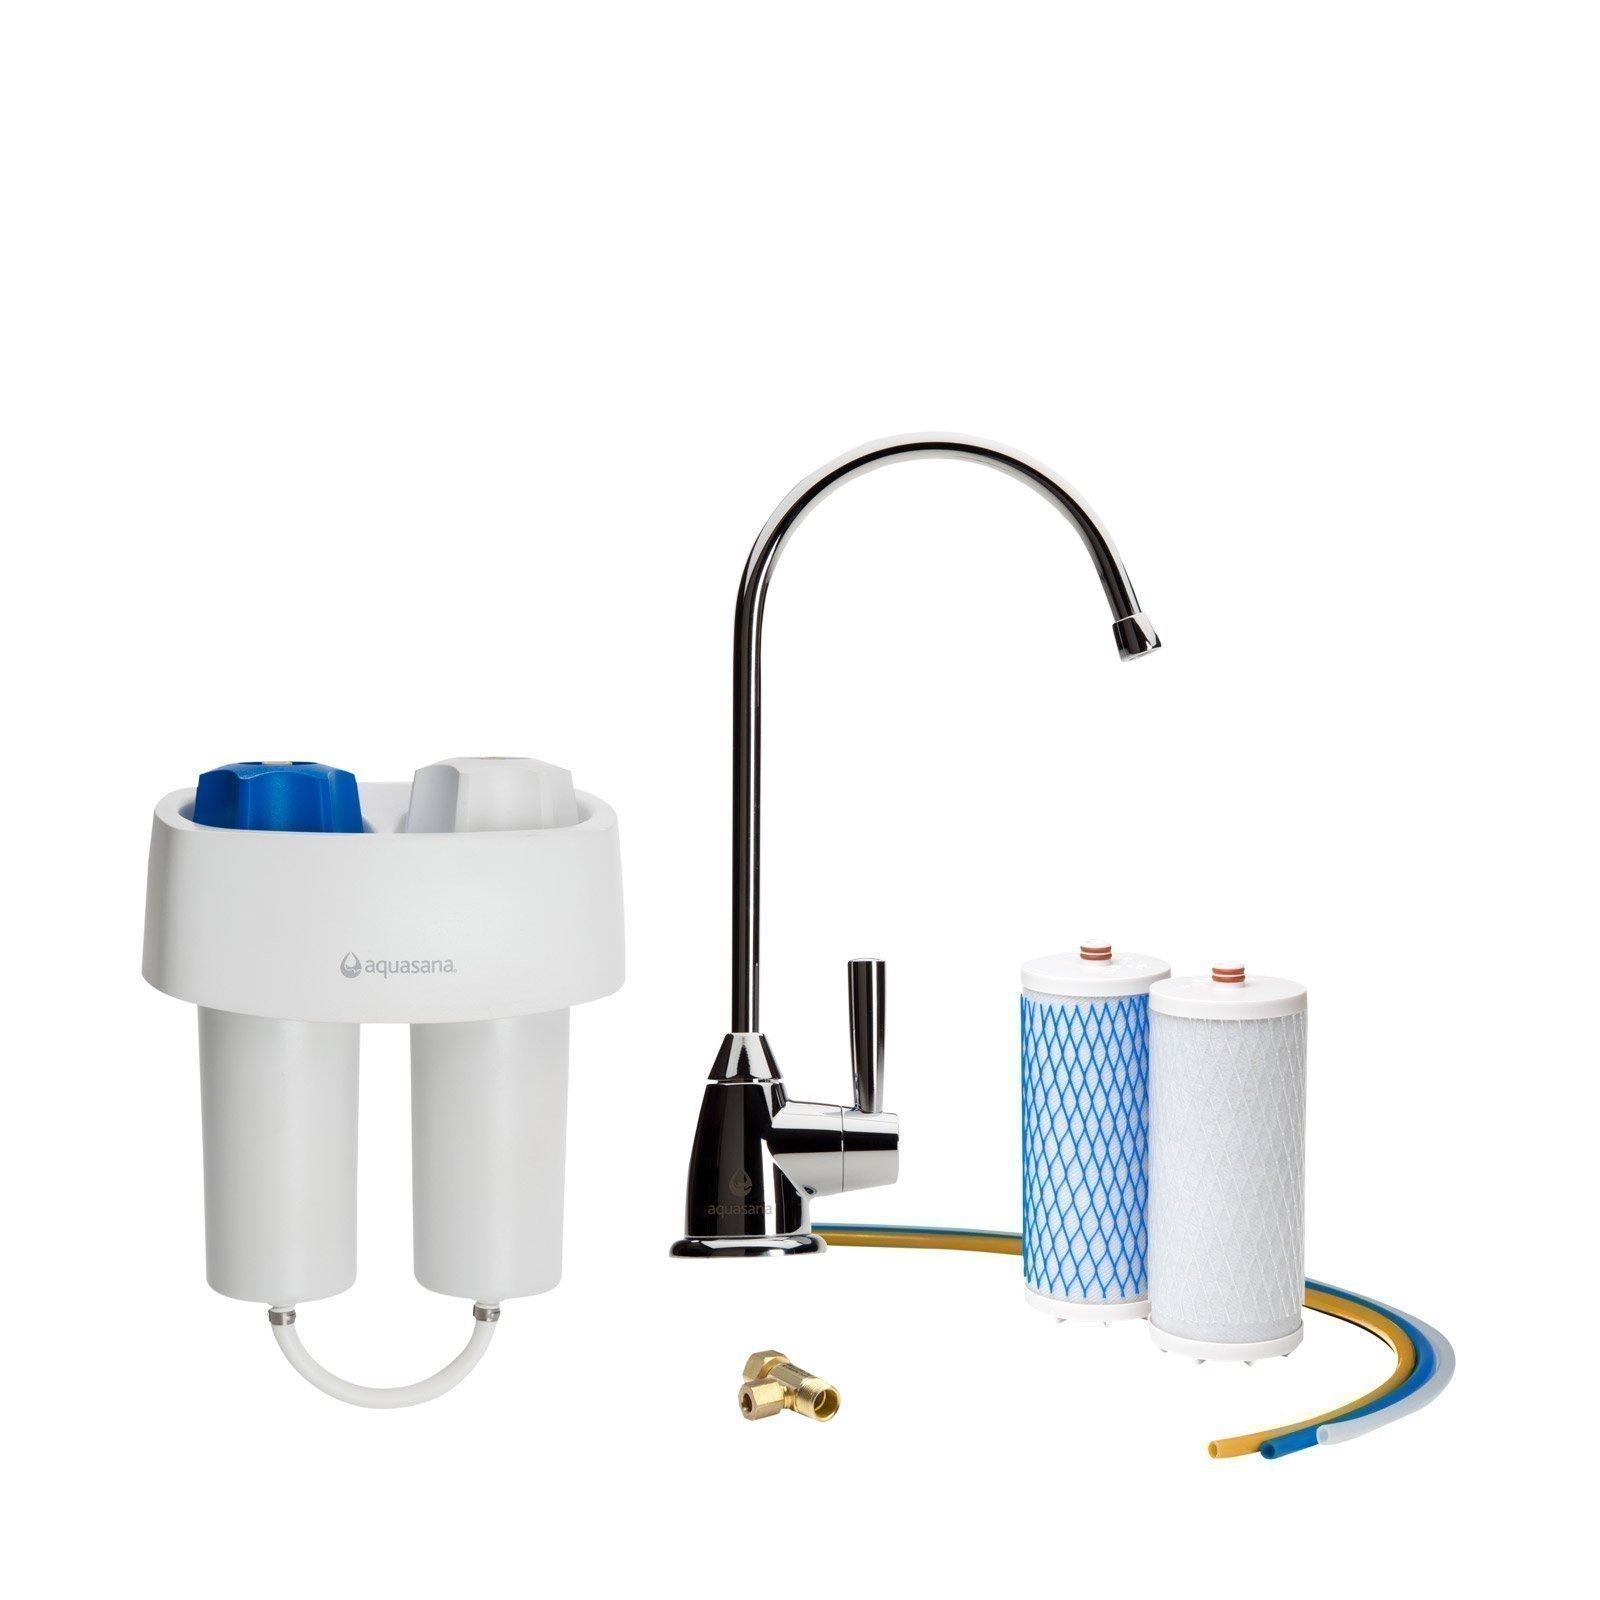 Image of Aquasana Under Counter Water Filter - Premium